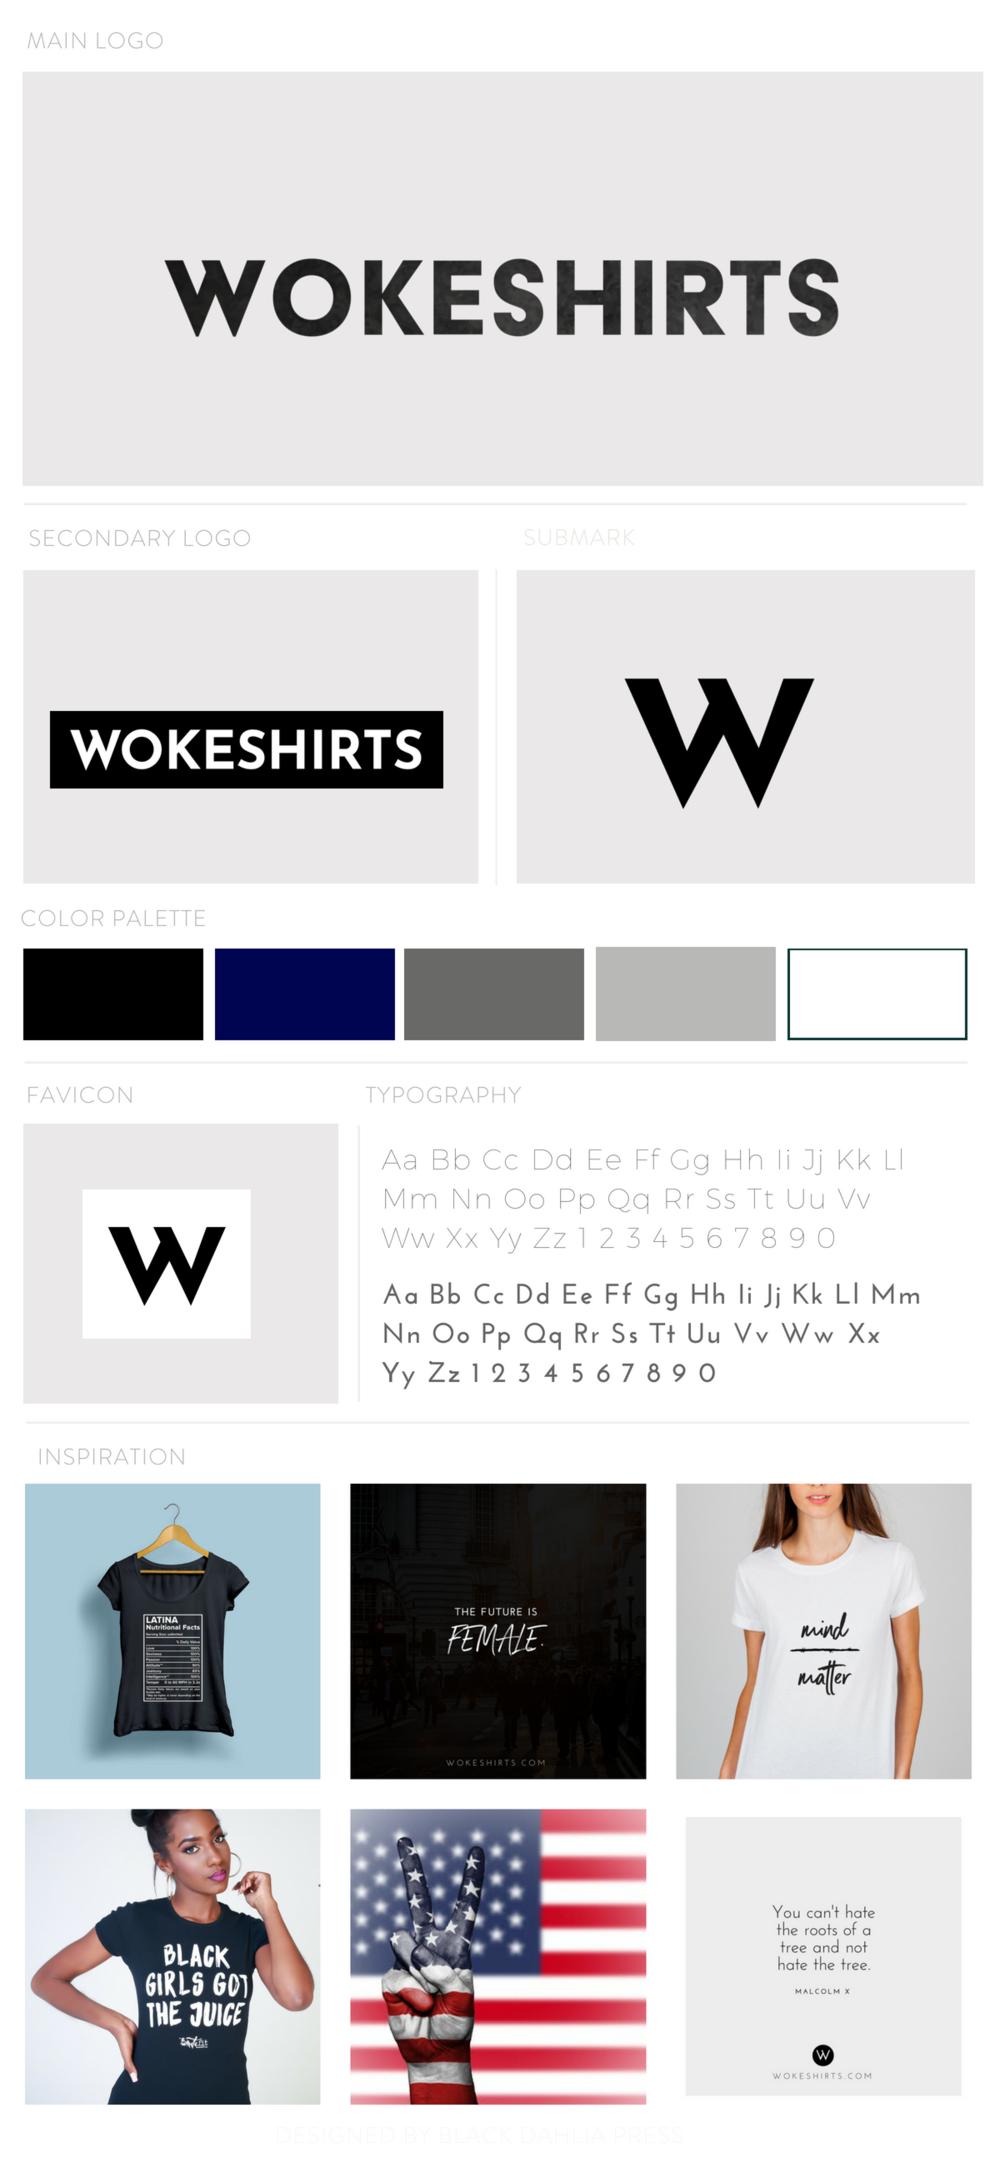 Wokeshirts (1).png